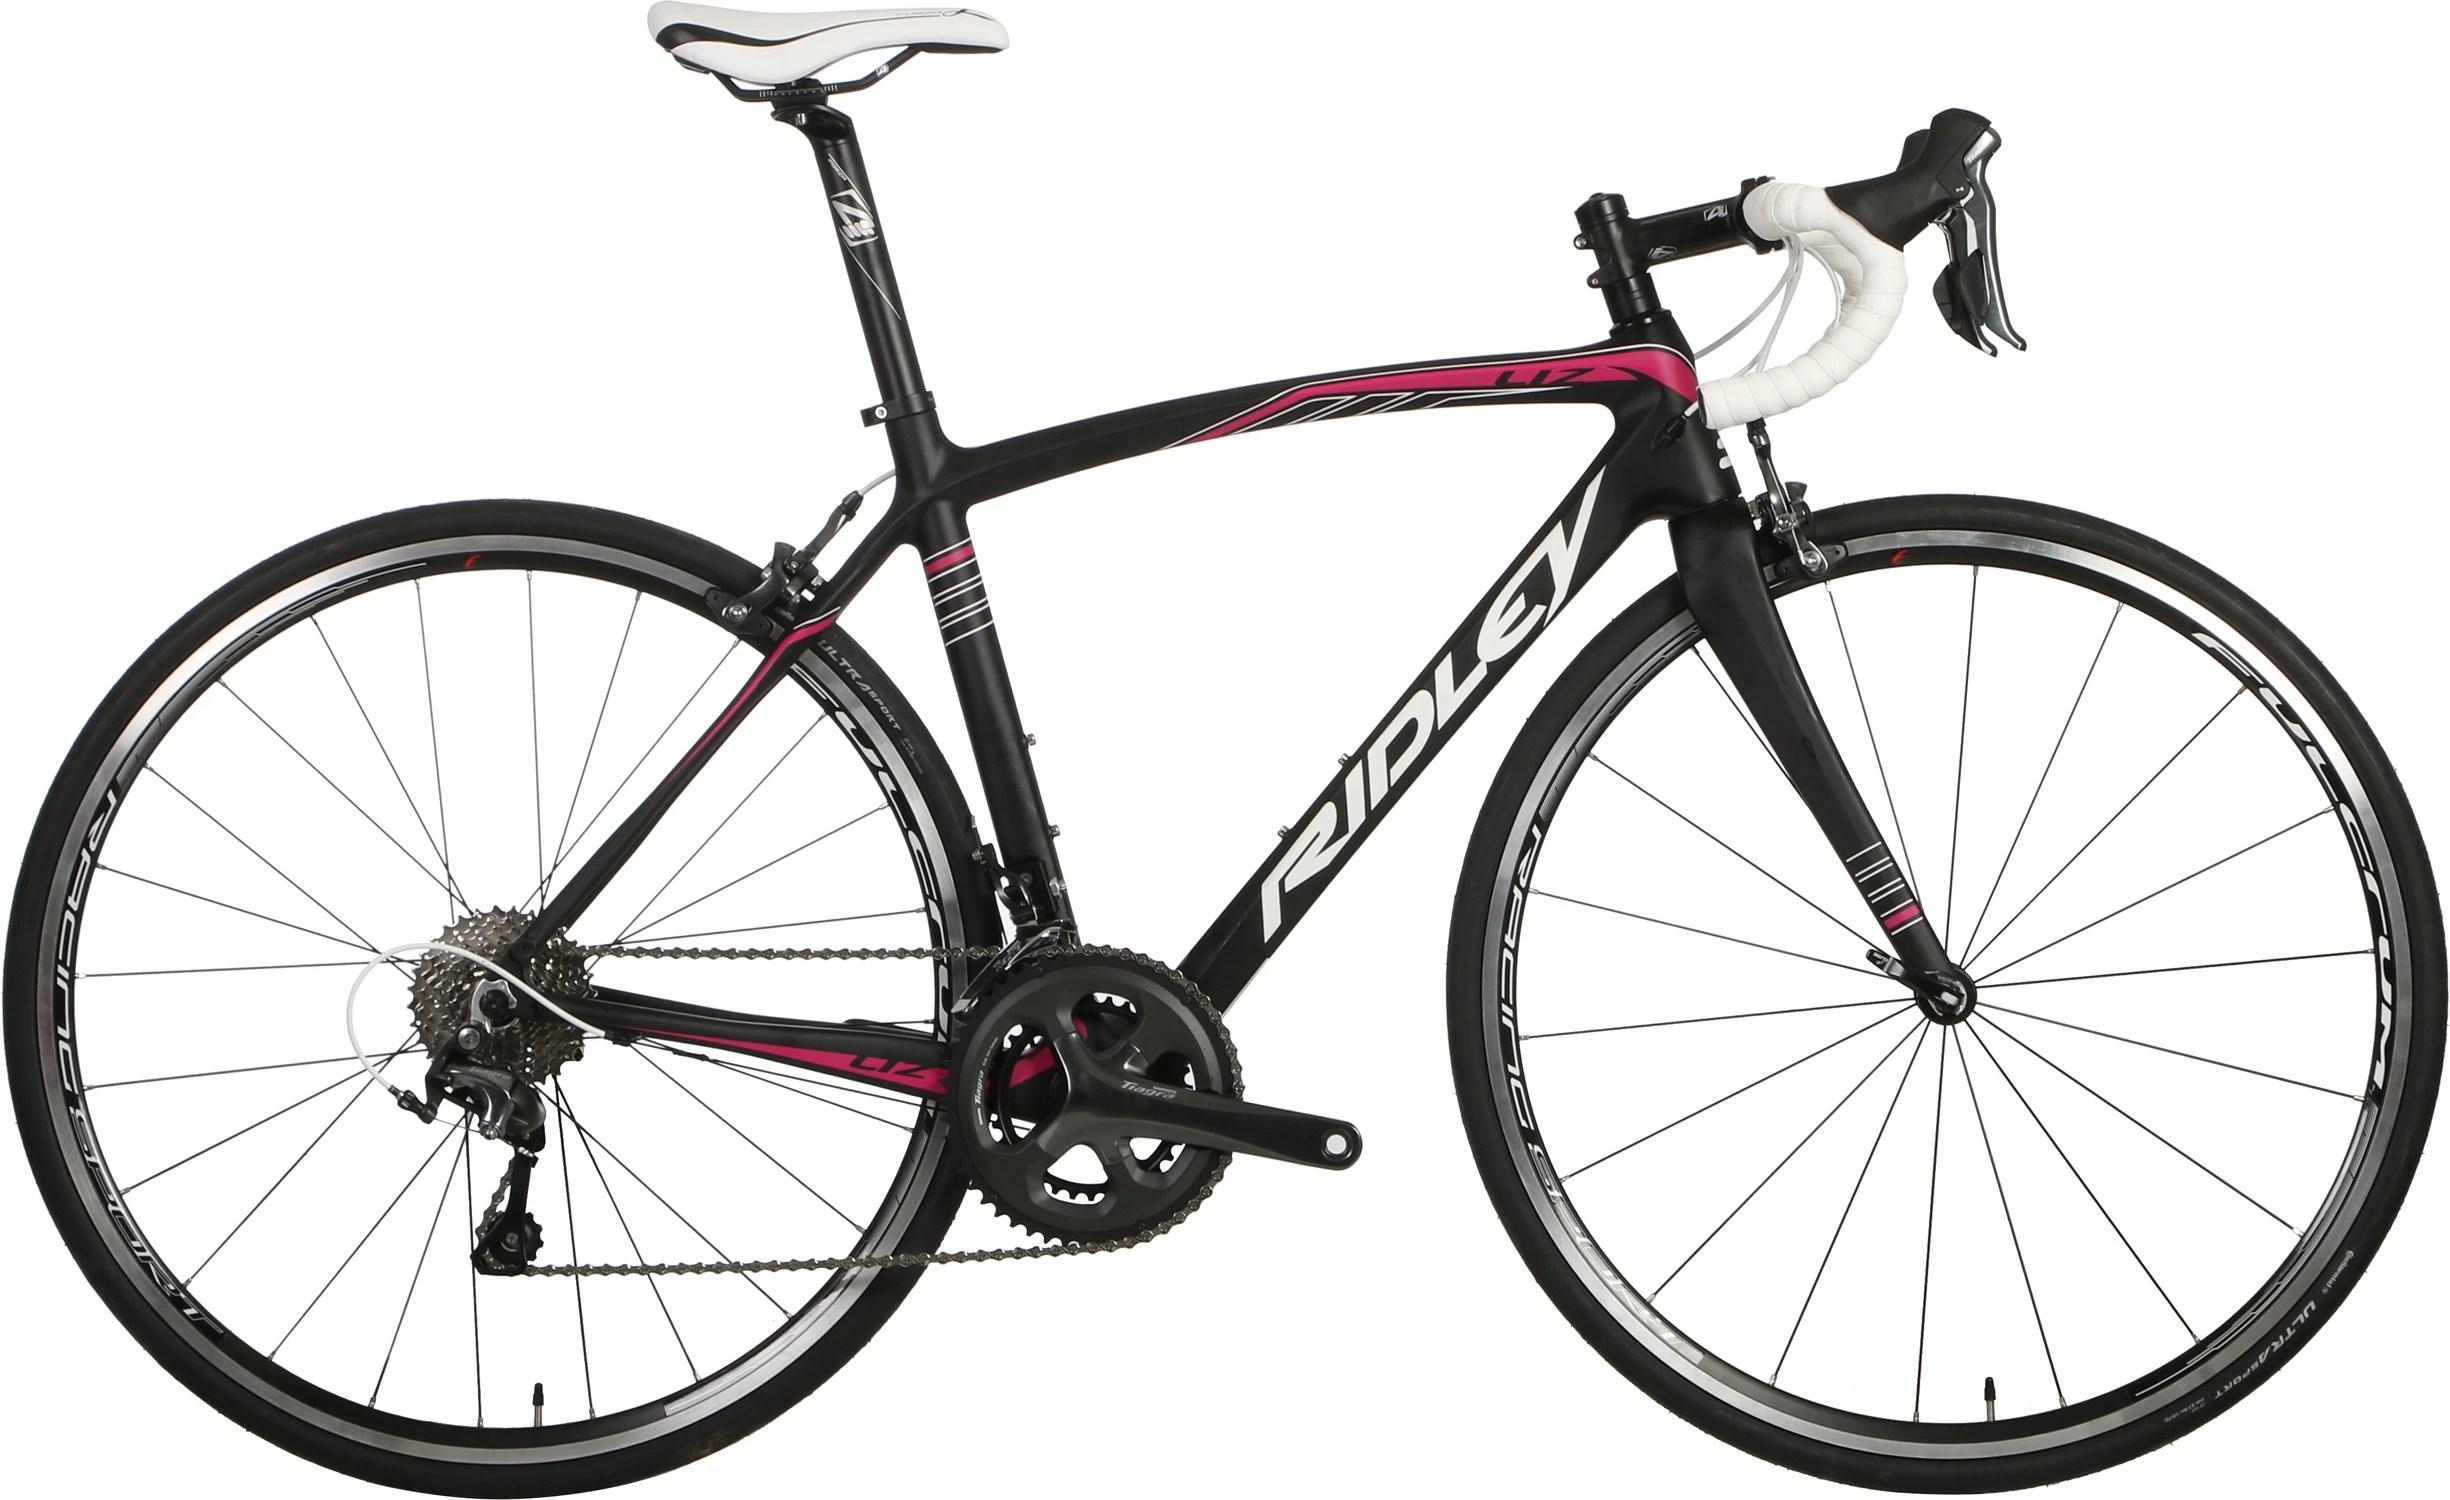 Ridley Liz C Tiagra 01bm Bike